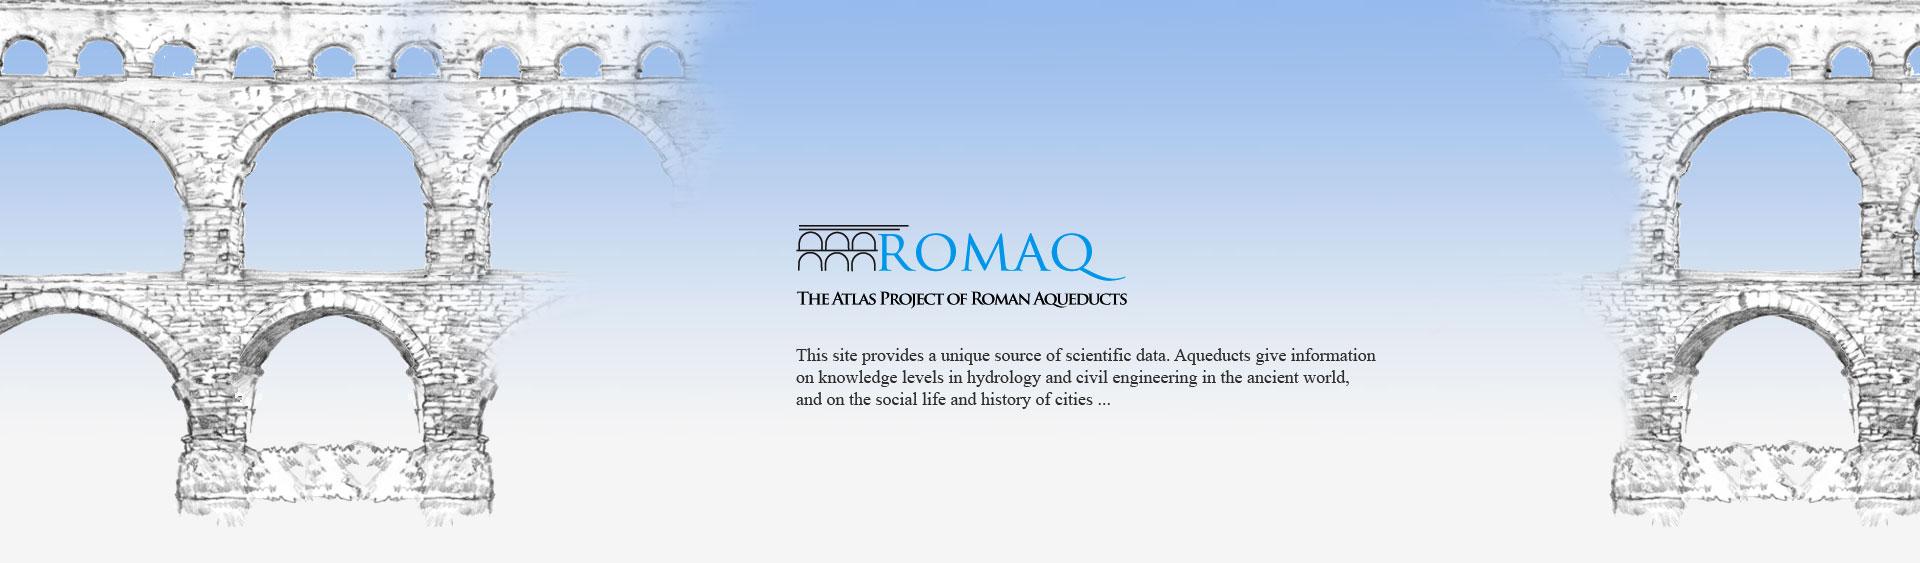 https://www.romaq.org/images/bg-header-aqueducts1.jpg